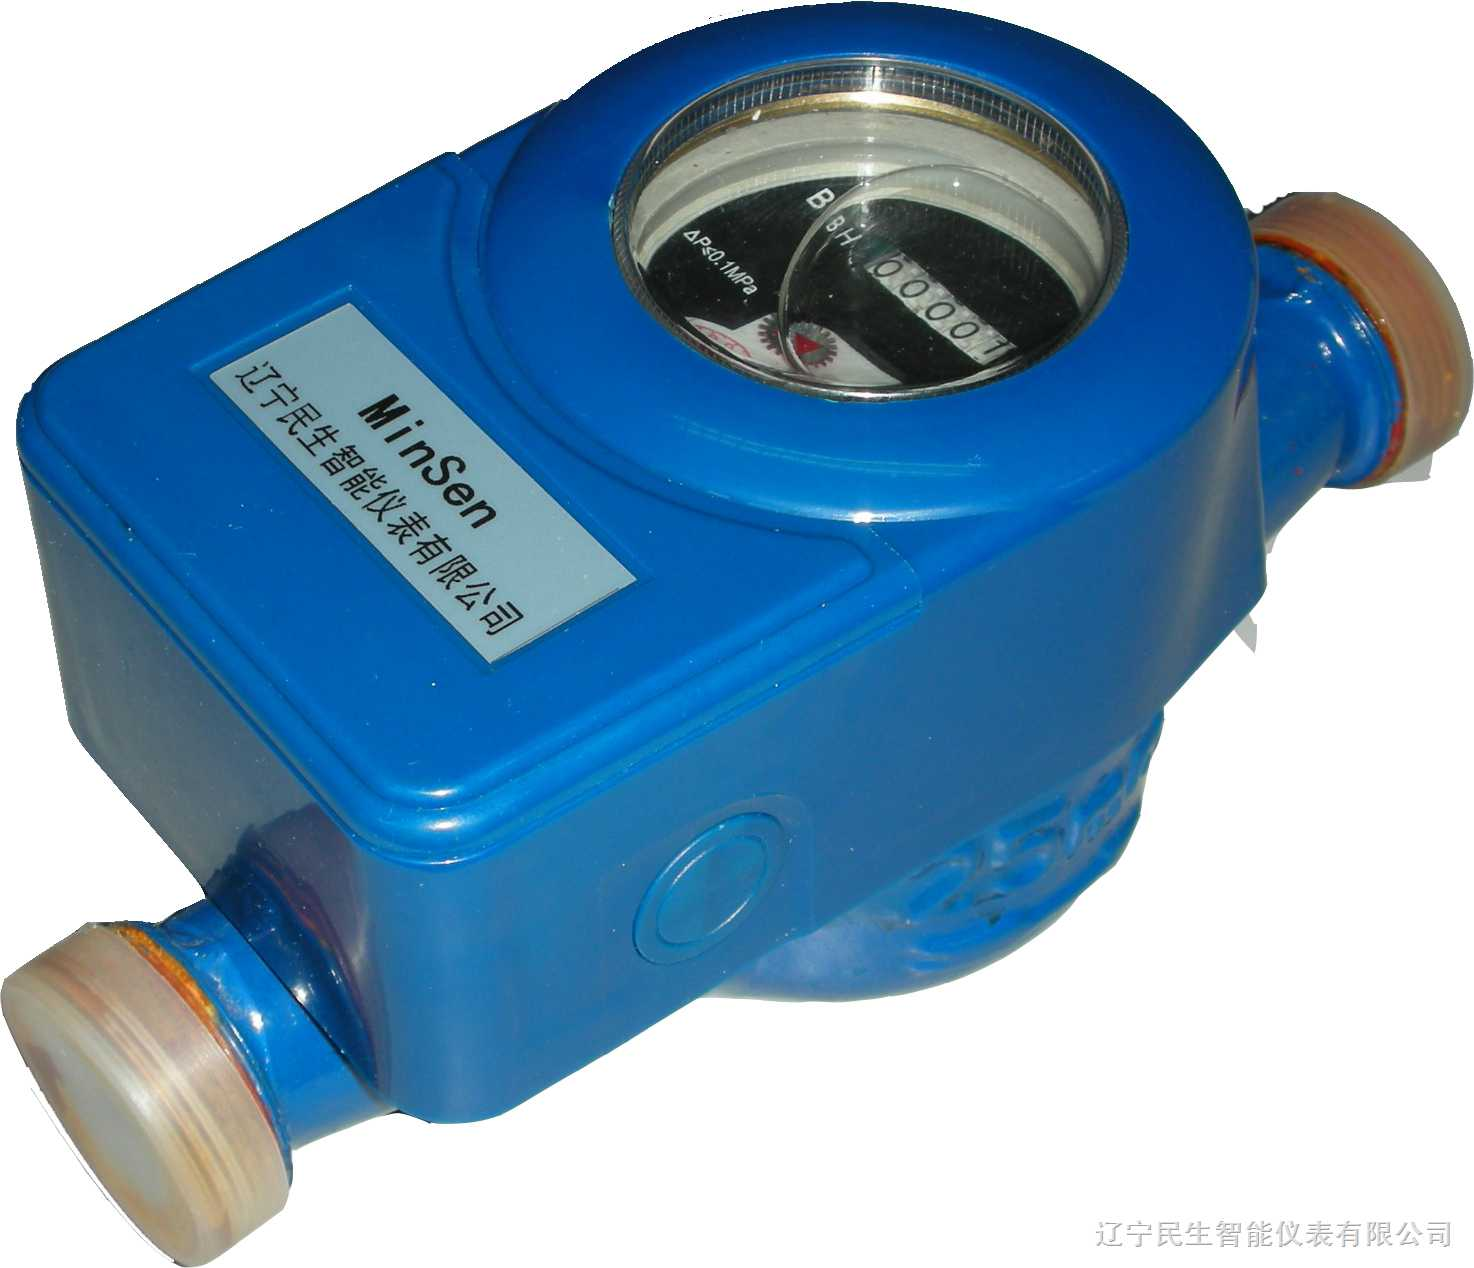 LXSZ智能濕式閥控水表